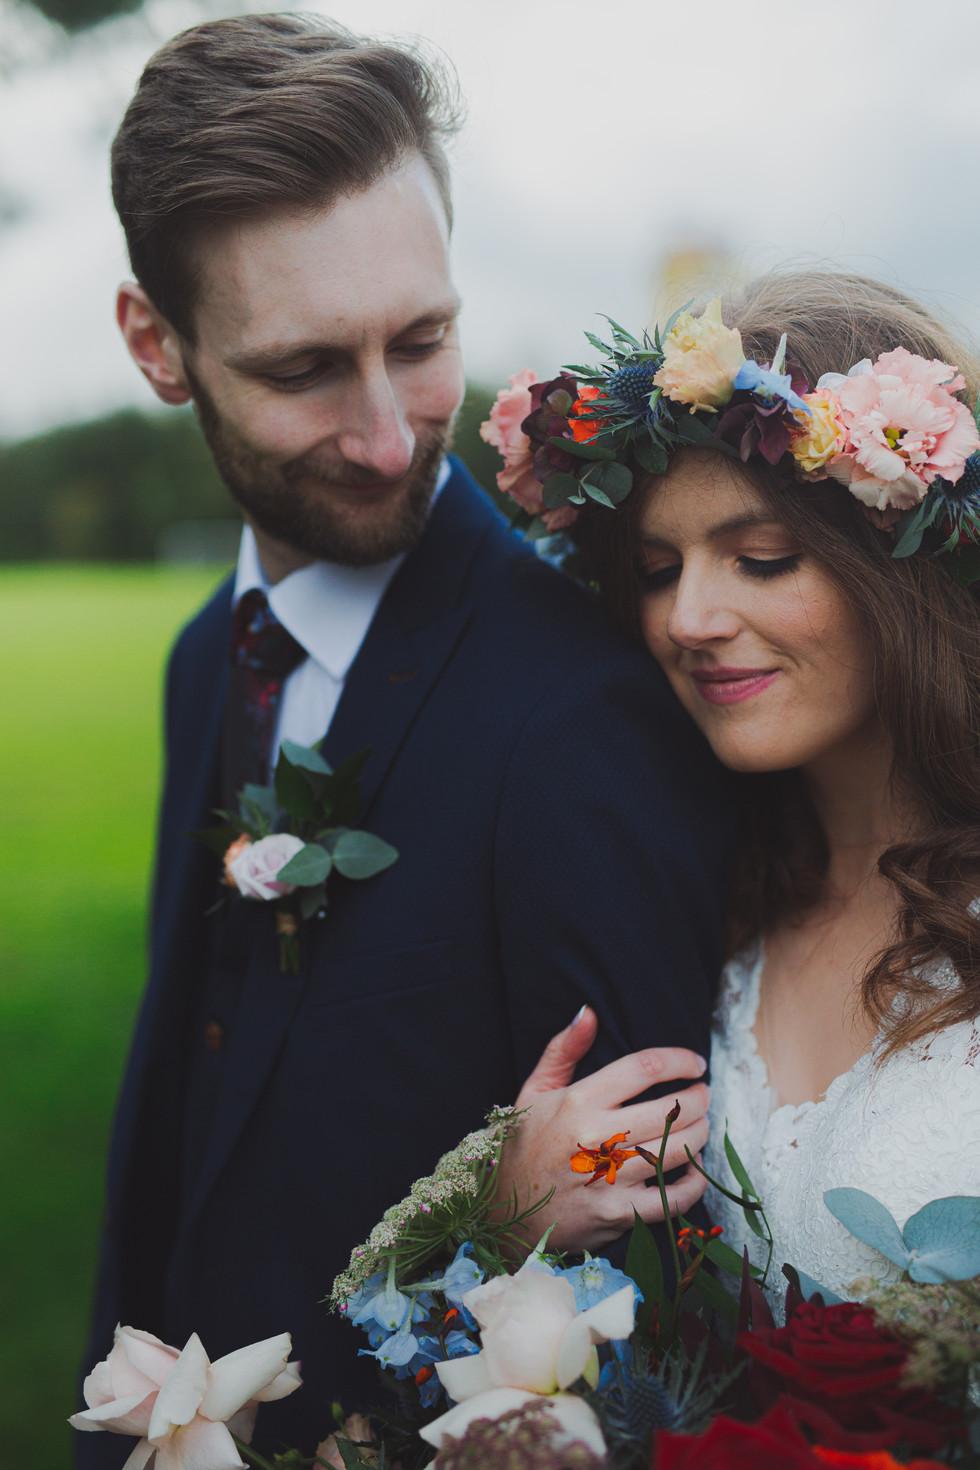 Harland & Wolff Wedding Photos   Boho Bride & Groom   Quirky Wedding   Living Witness Weddings